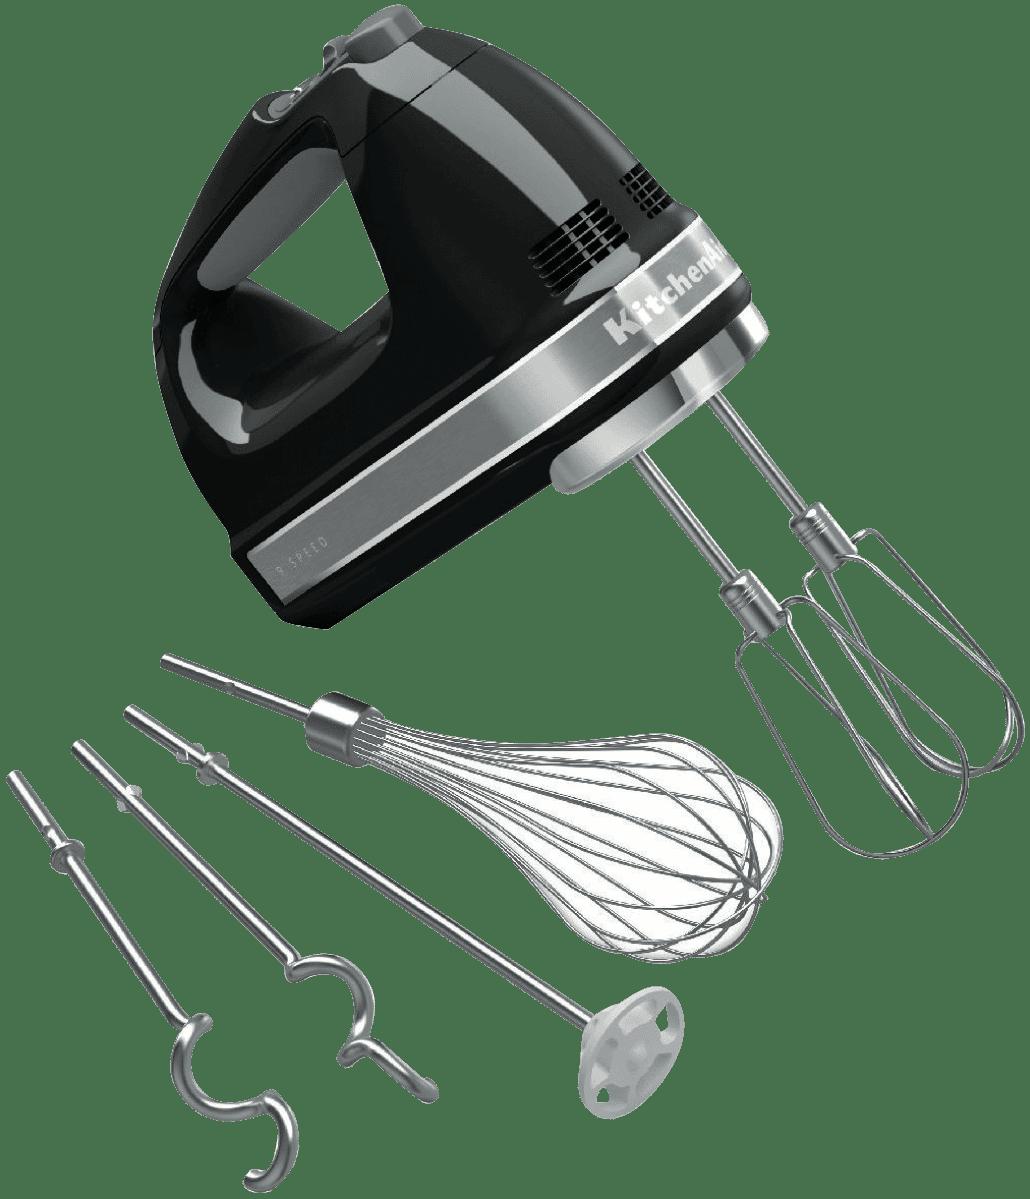 Artisan Hand Mixer - Onyx Black